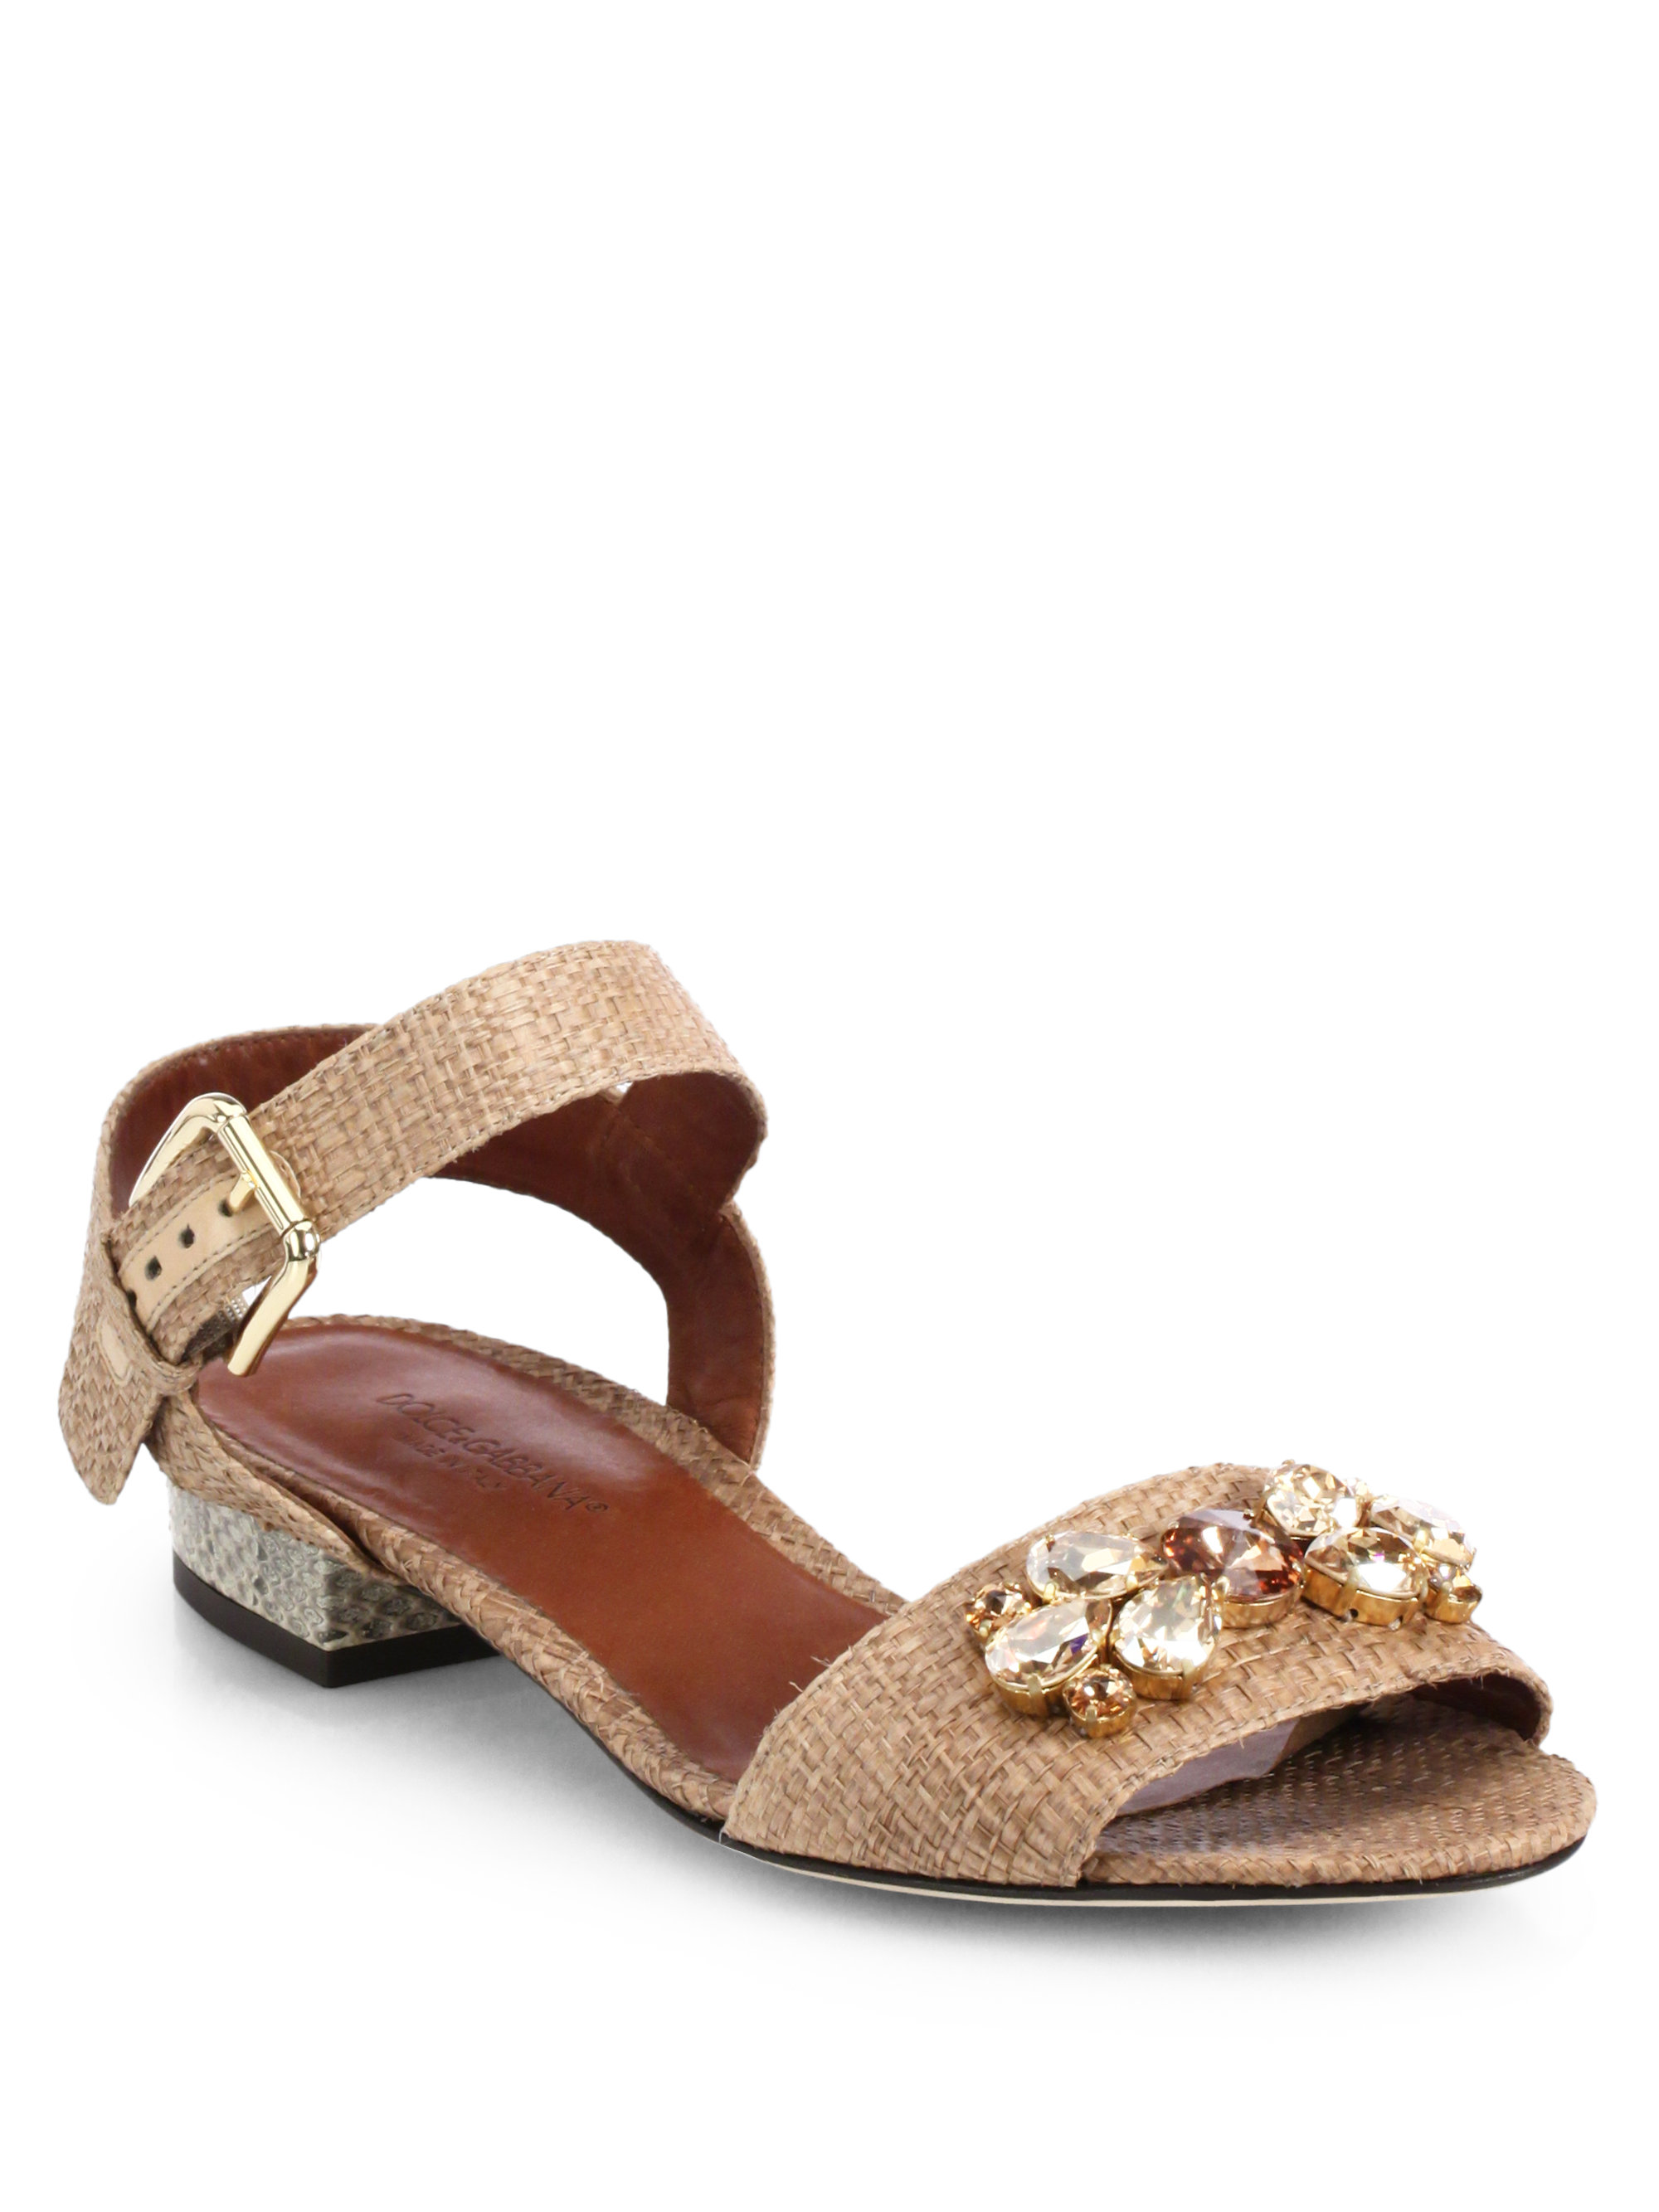 Snakeskin and leather slippers Dolce & Gabbana KIz7dPD6Mm